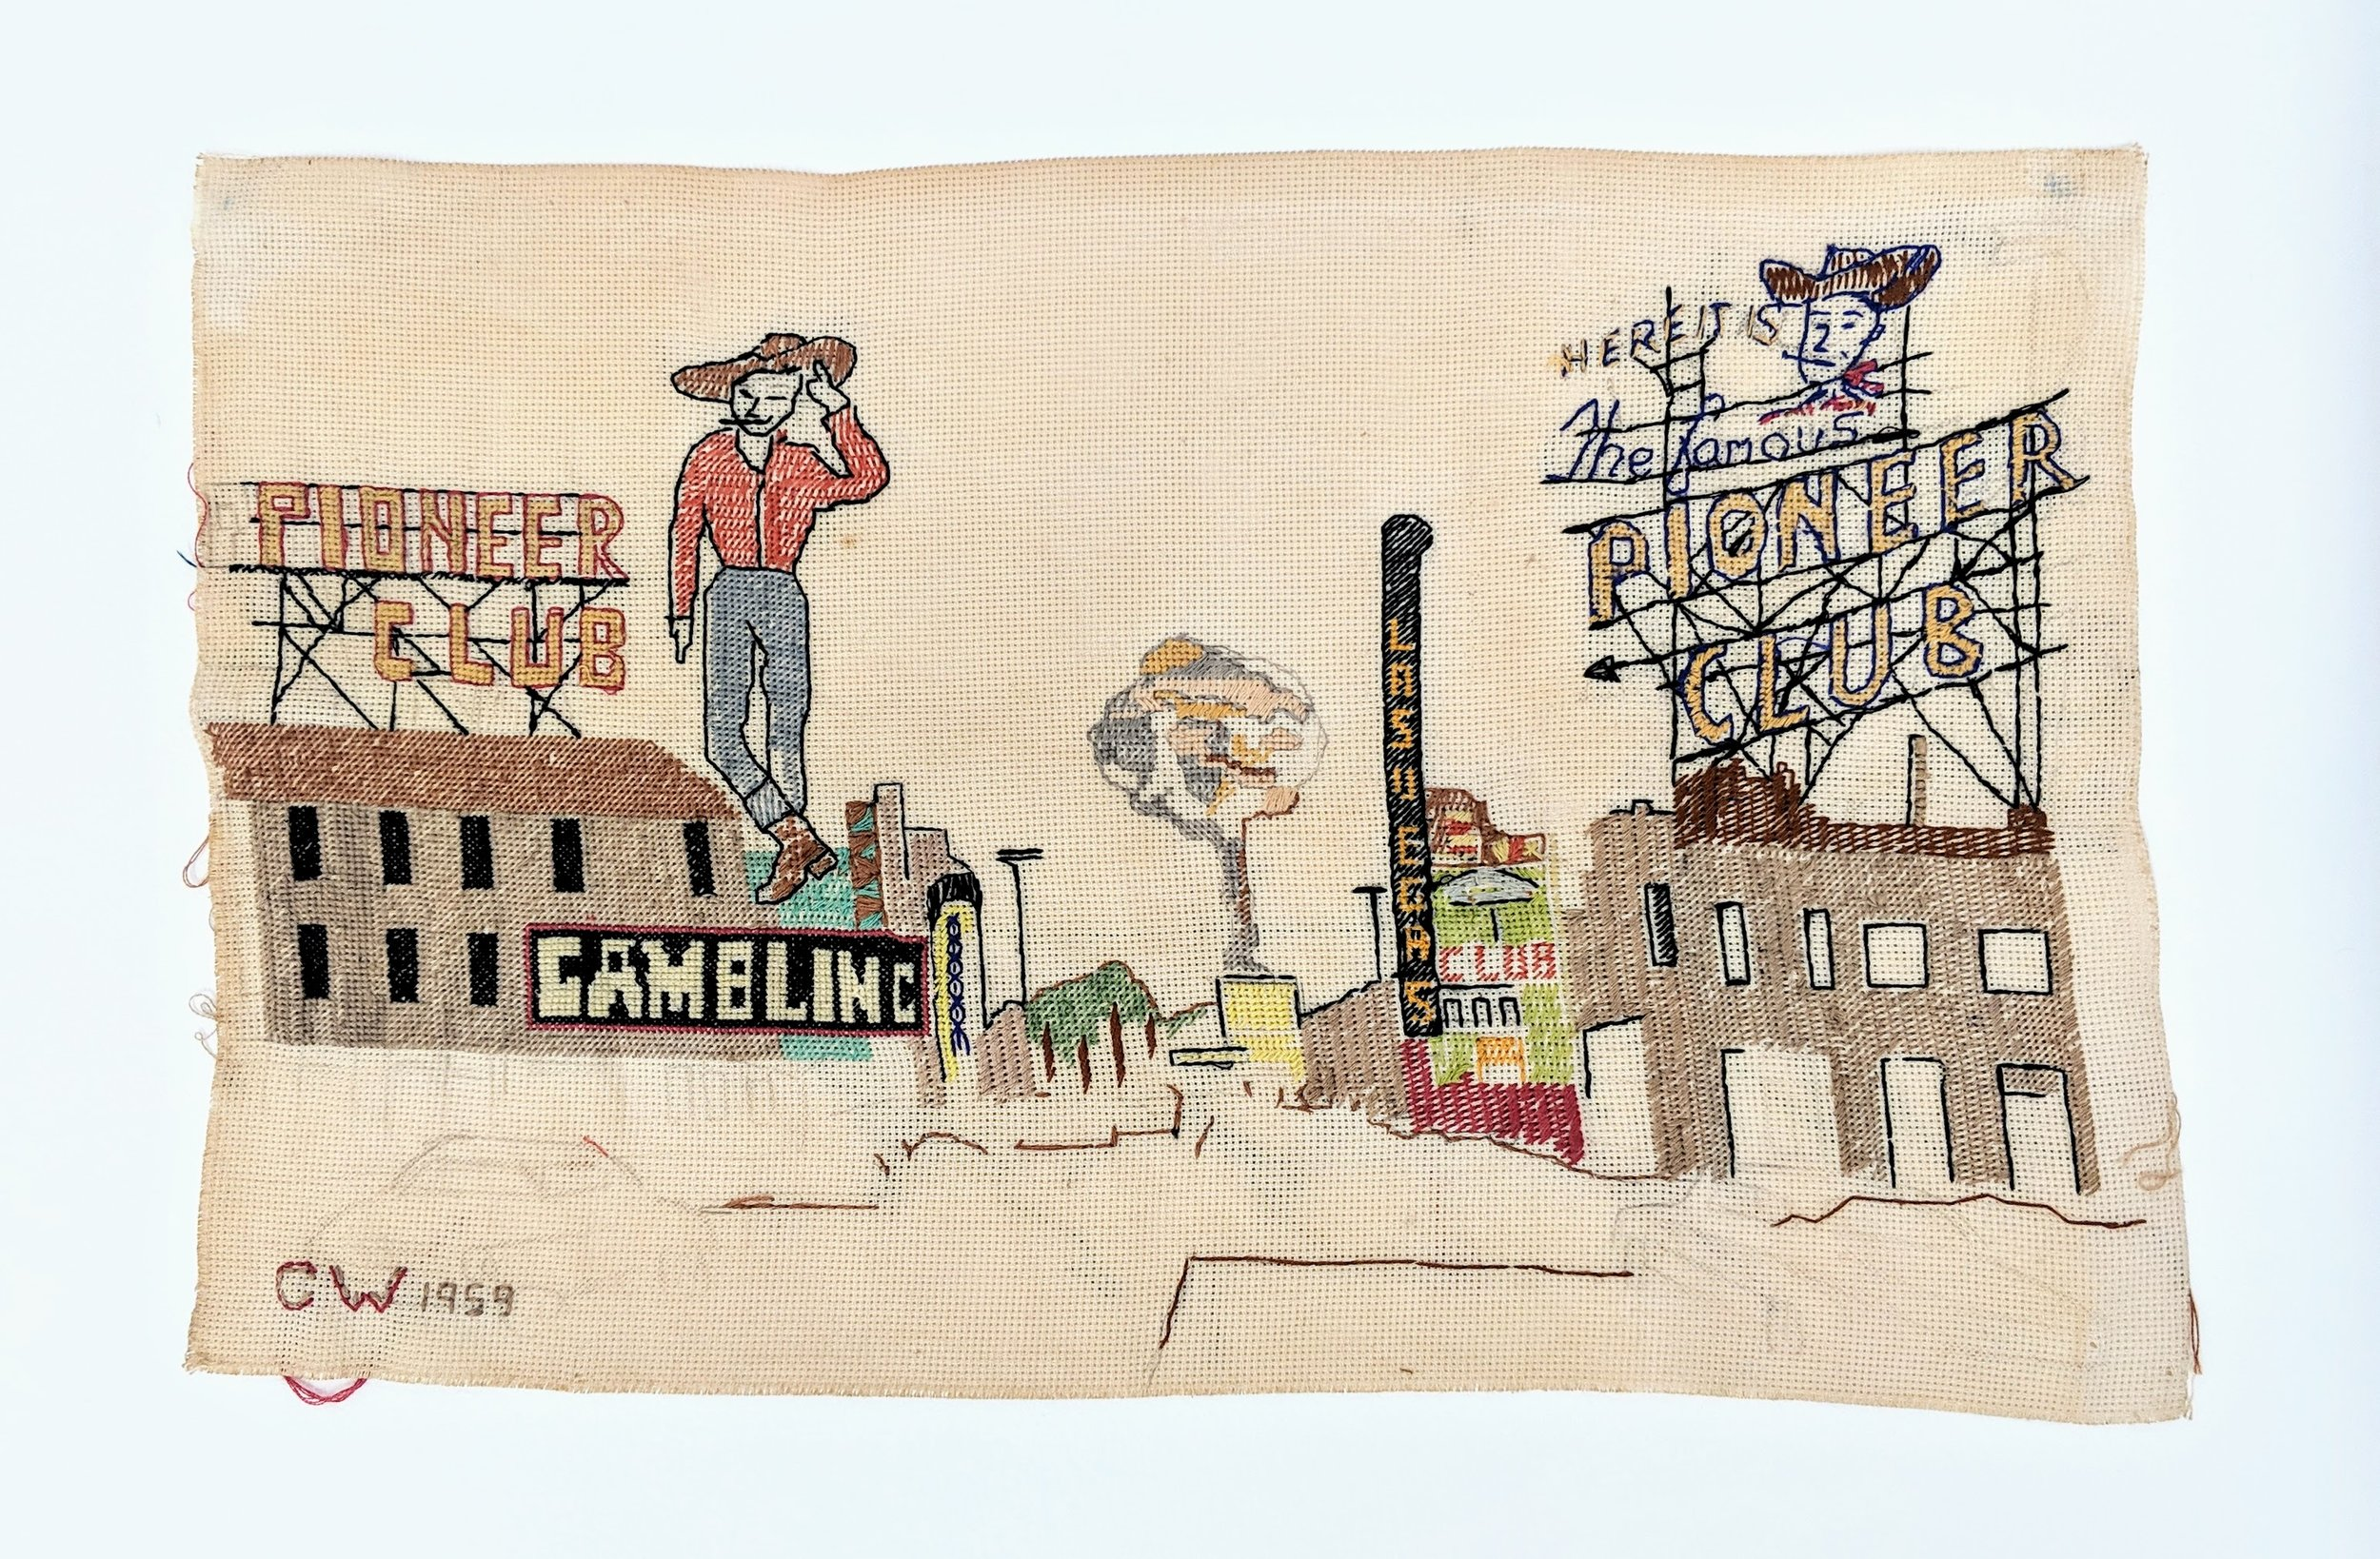 Cross-stitch ,  1959, 26 x 42cm Attributed to Carol Dorothy White of Spring Valley, Nevada